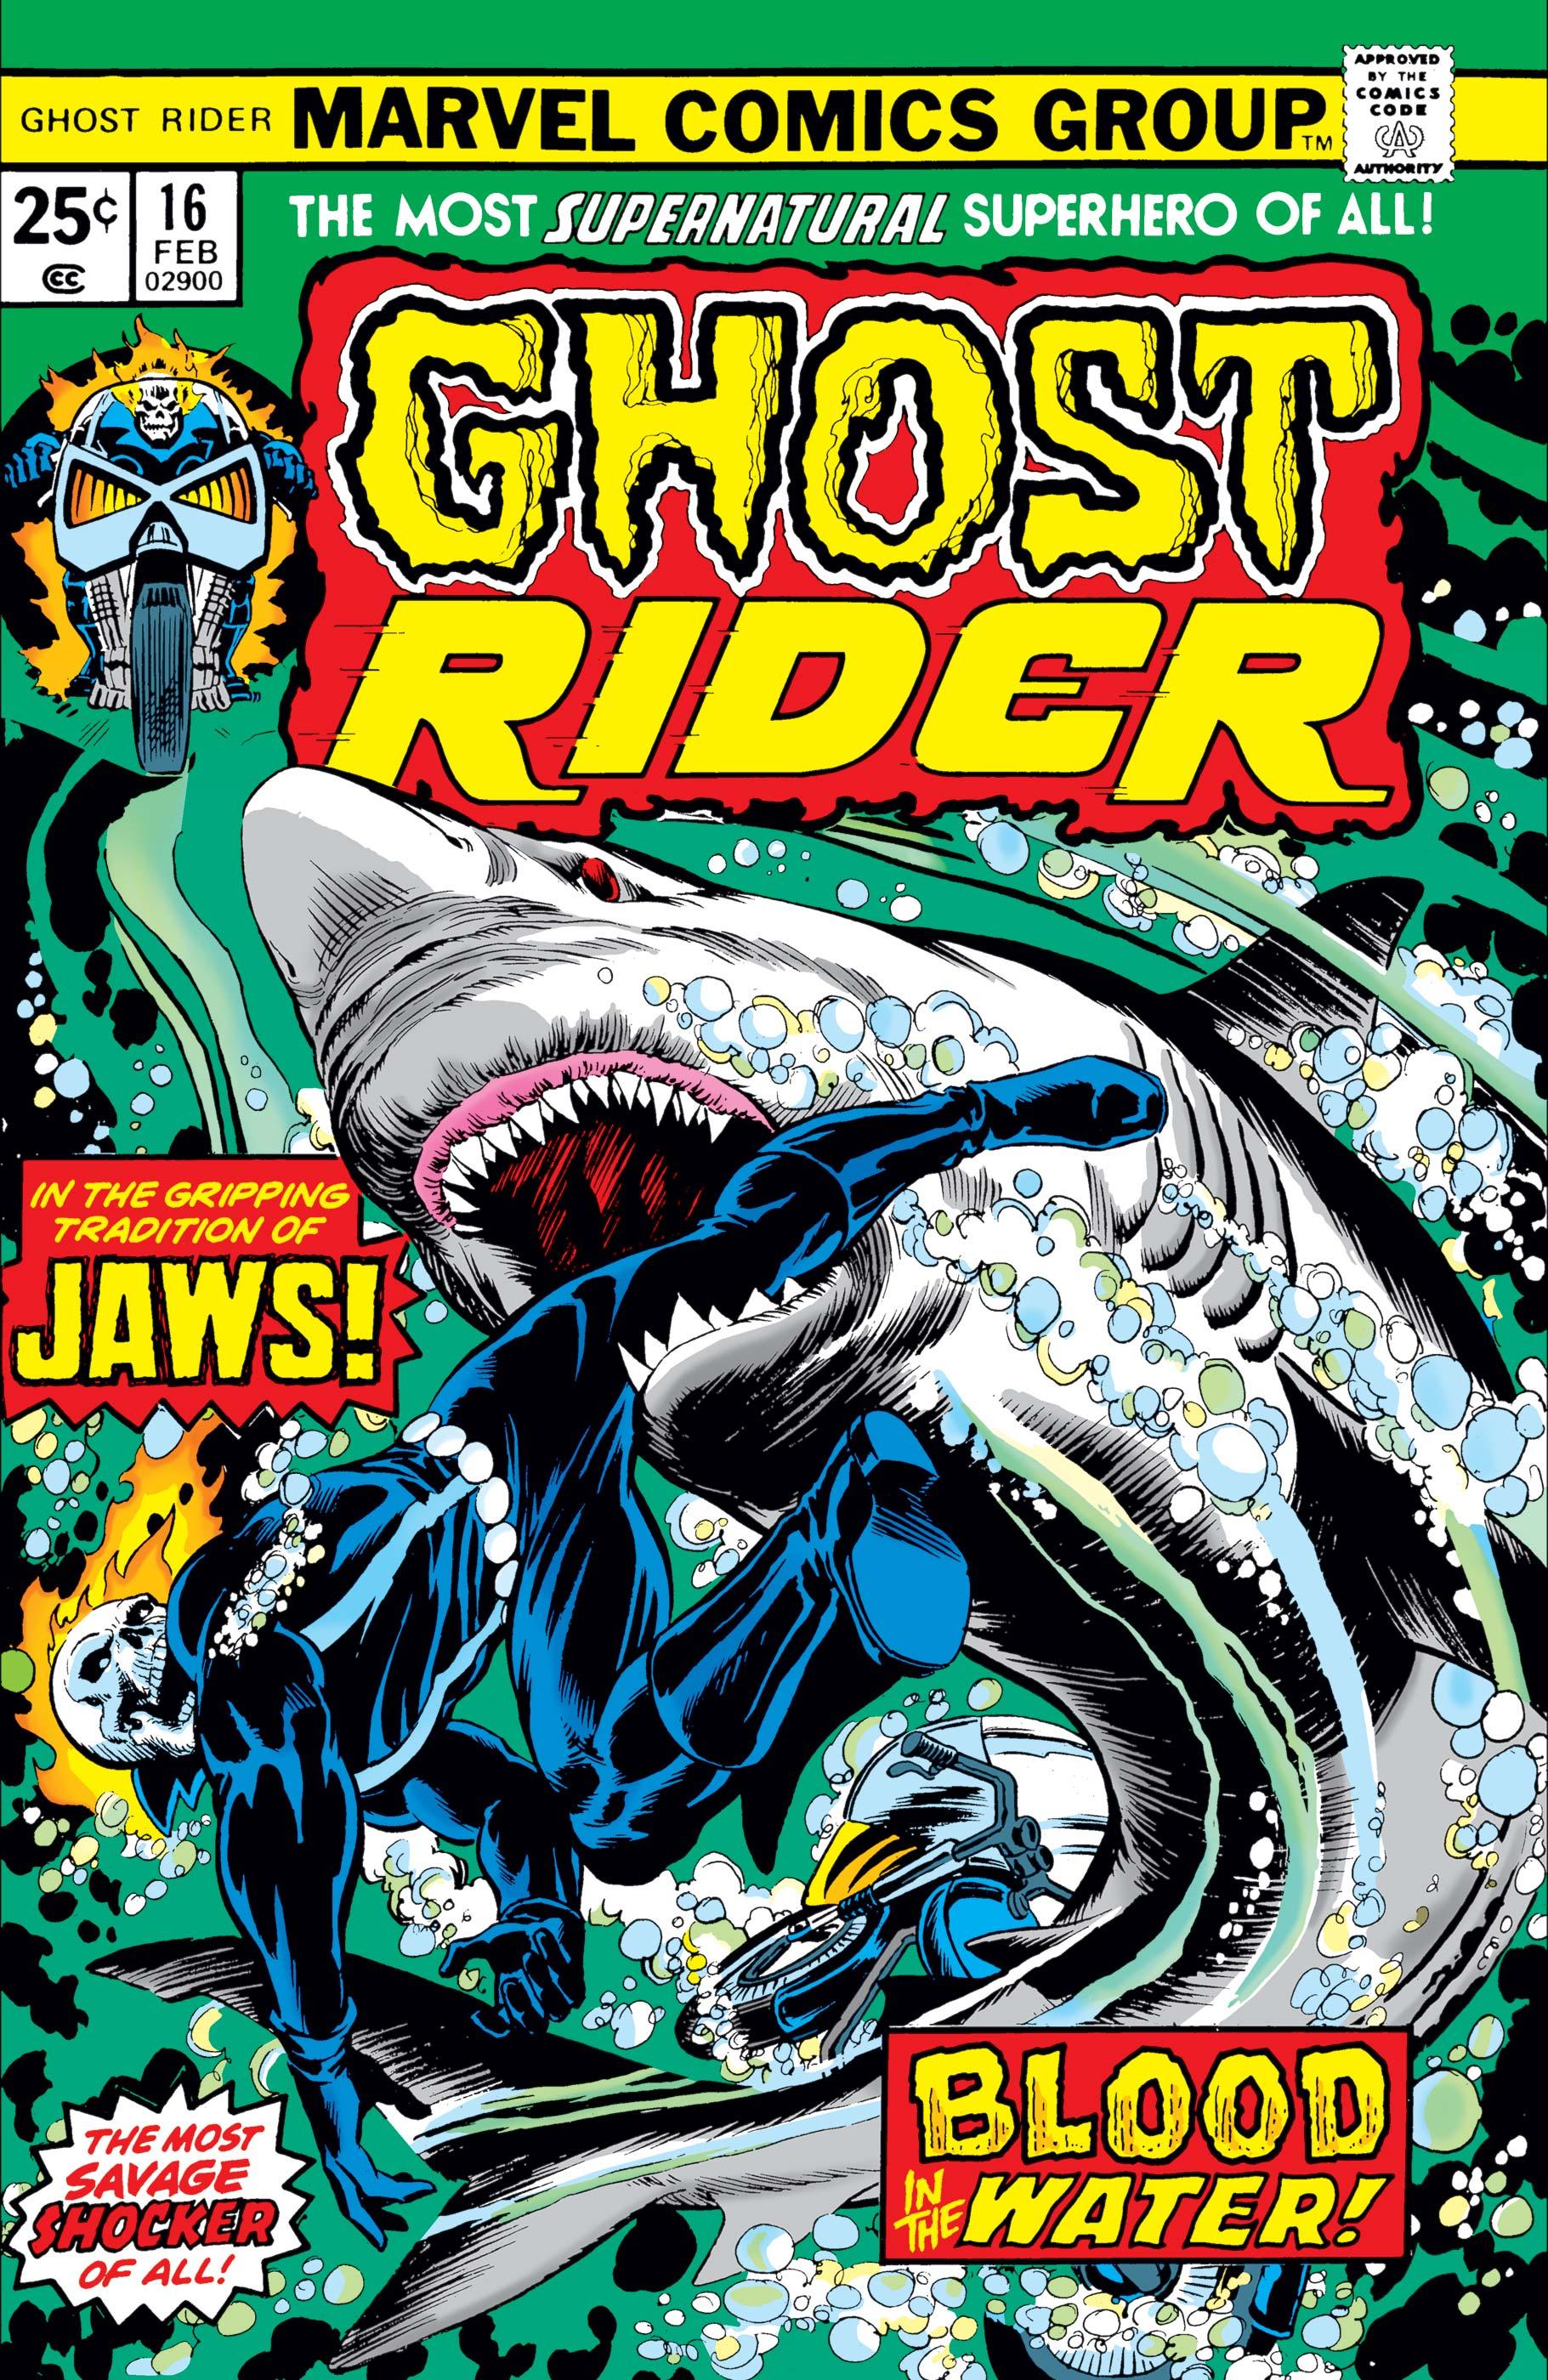 Ghost Rider (1973) #16